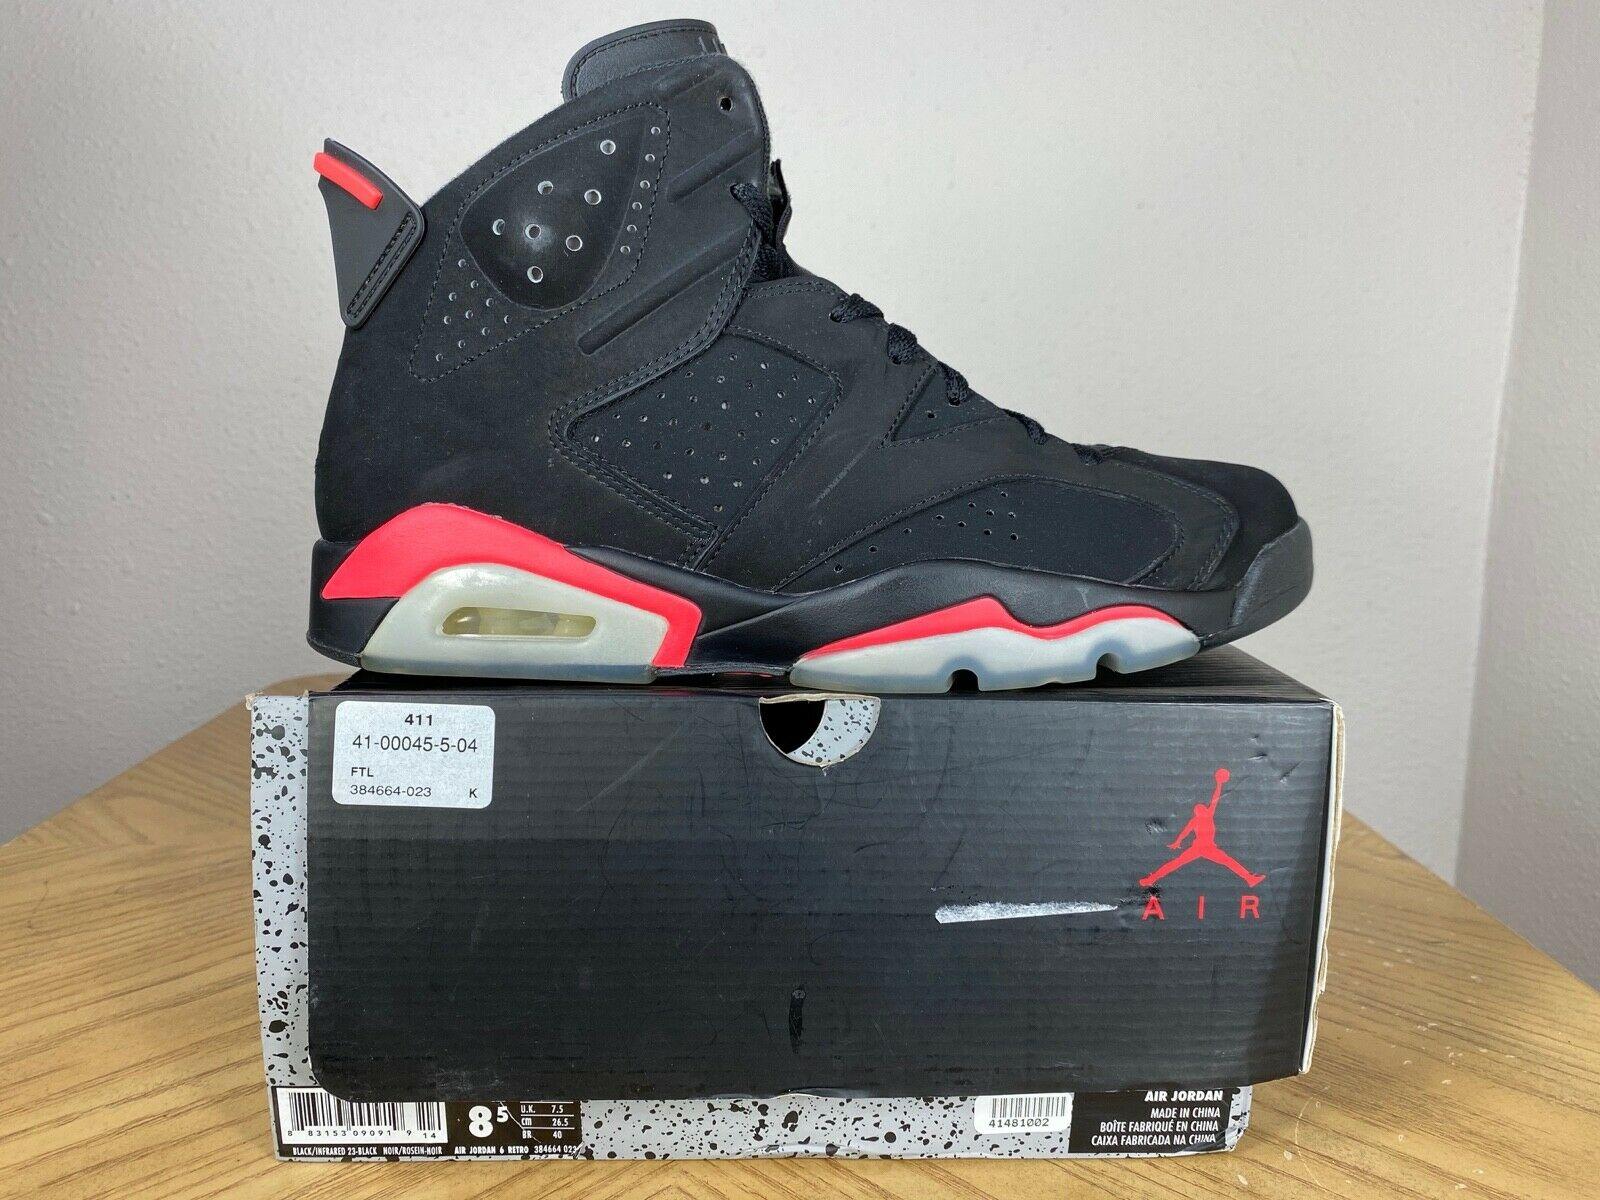 Jordan 6 Retro Infrared Black 2014